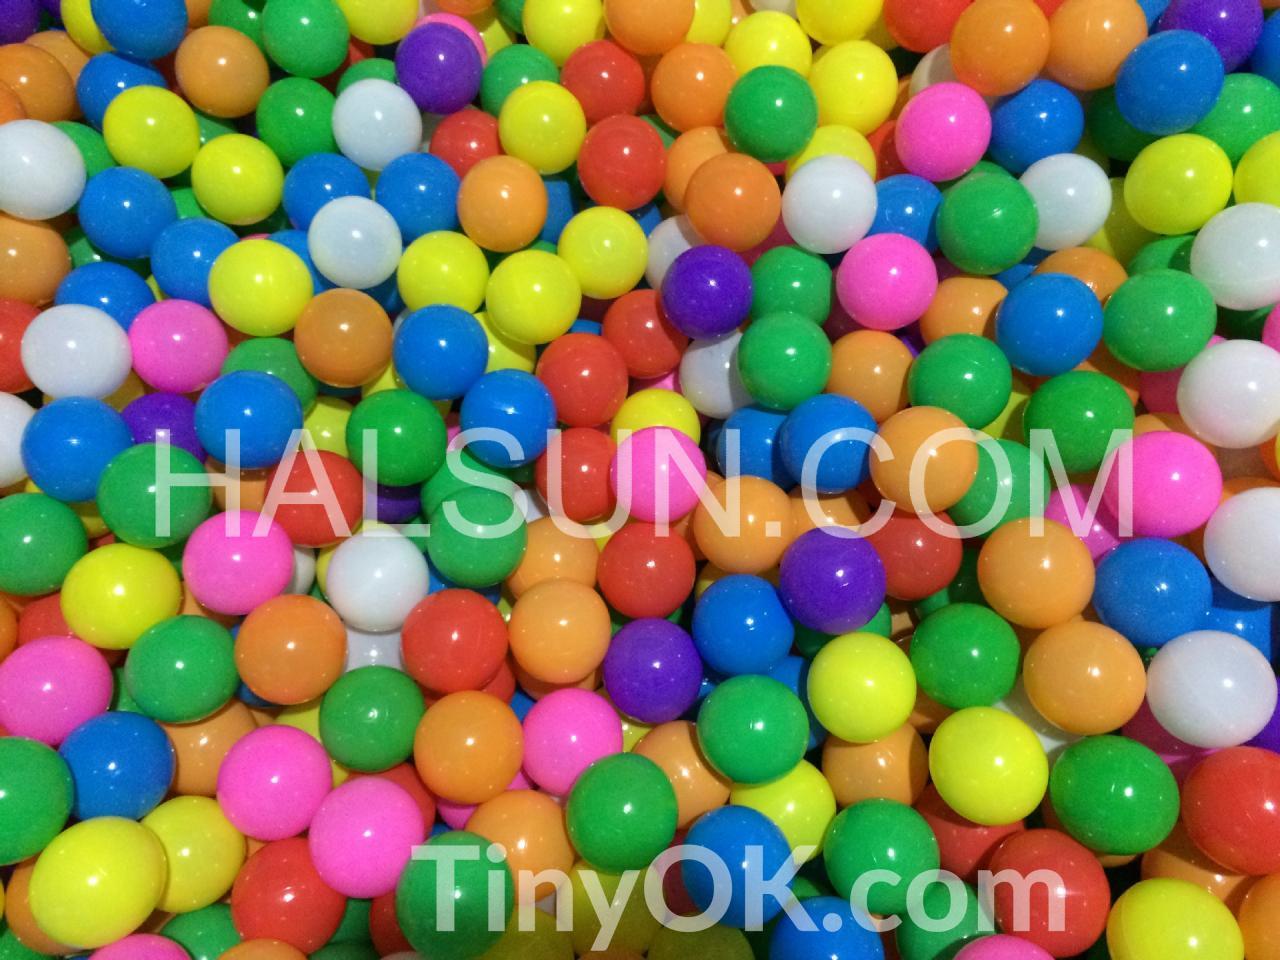 plastic-ocean-balls-8.jpg